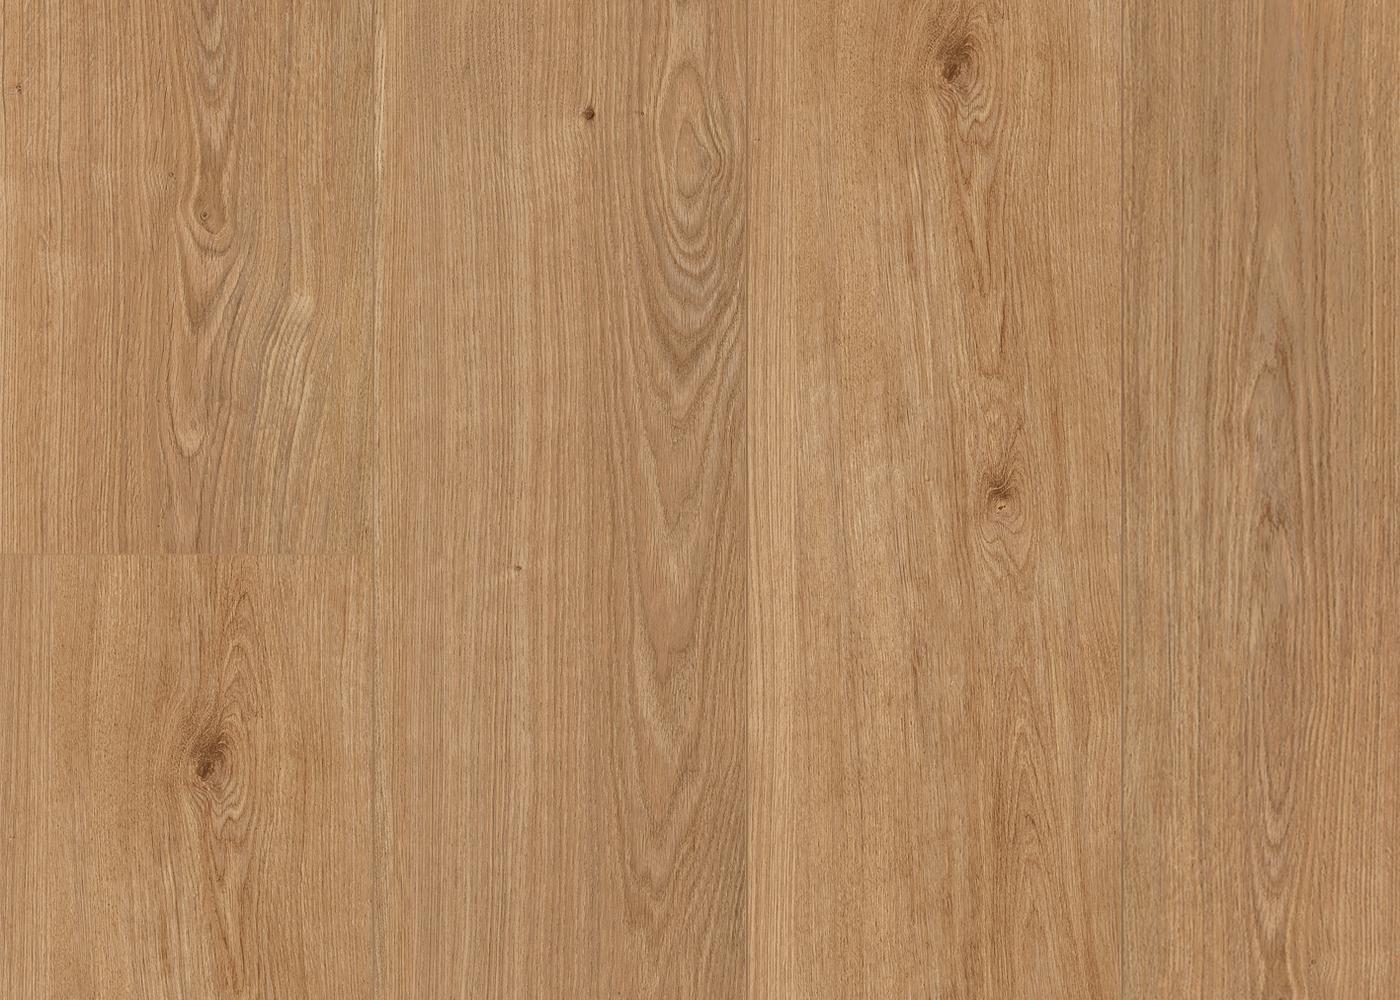 Vinyle rigide Chêne Toffee passage commercial 4.5x240x2000